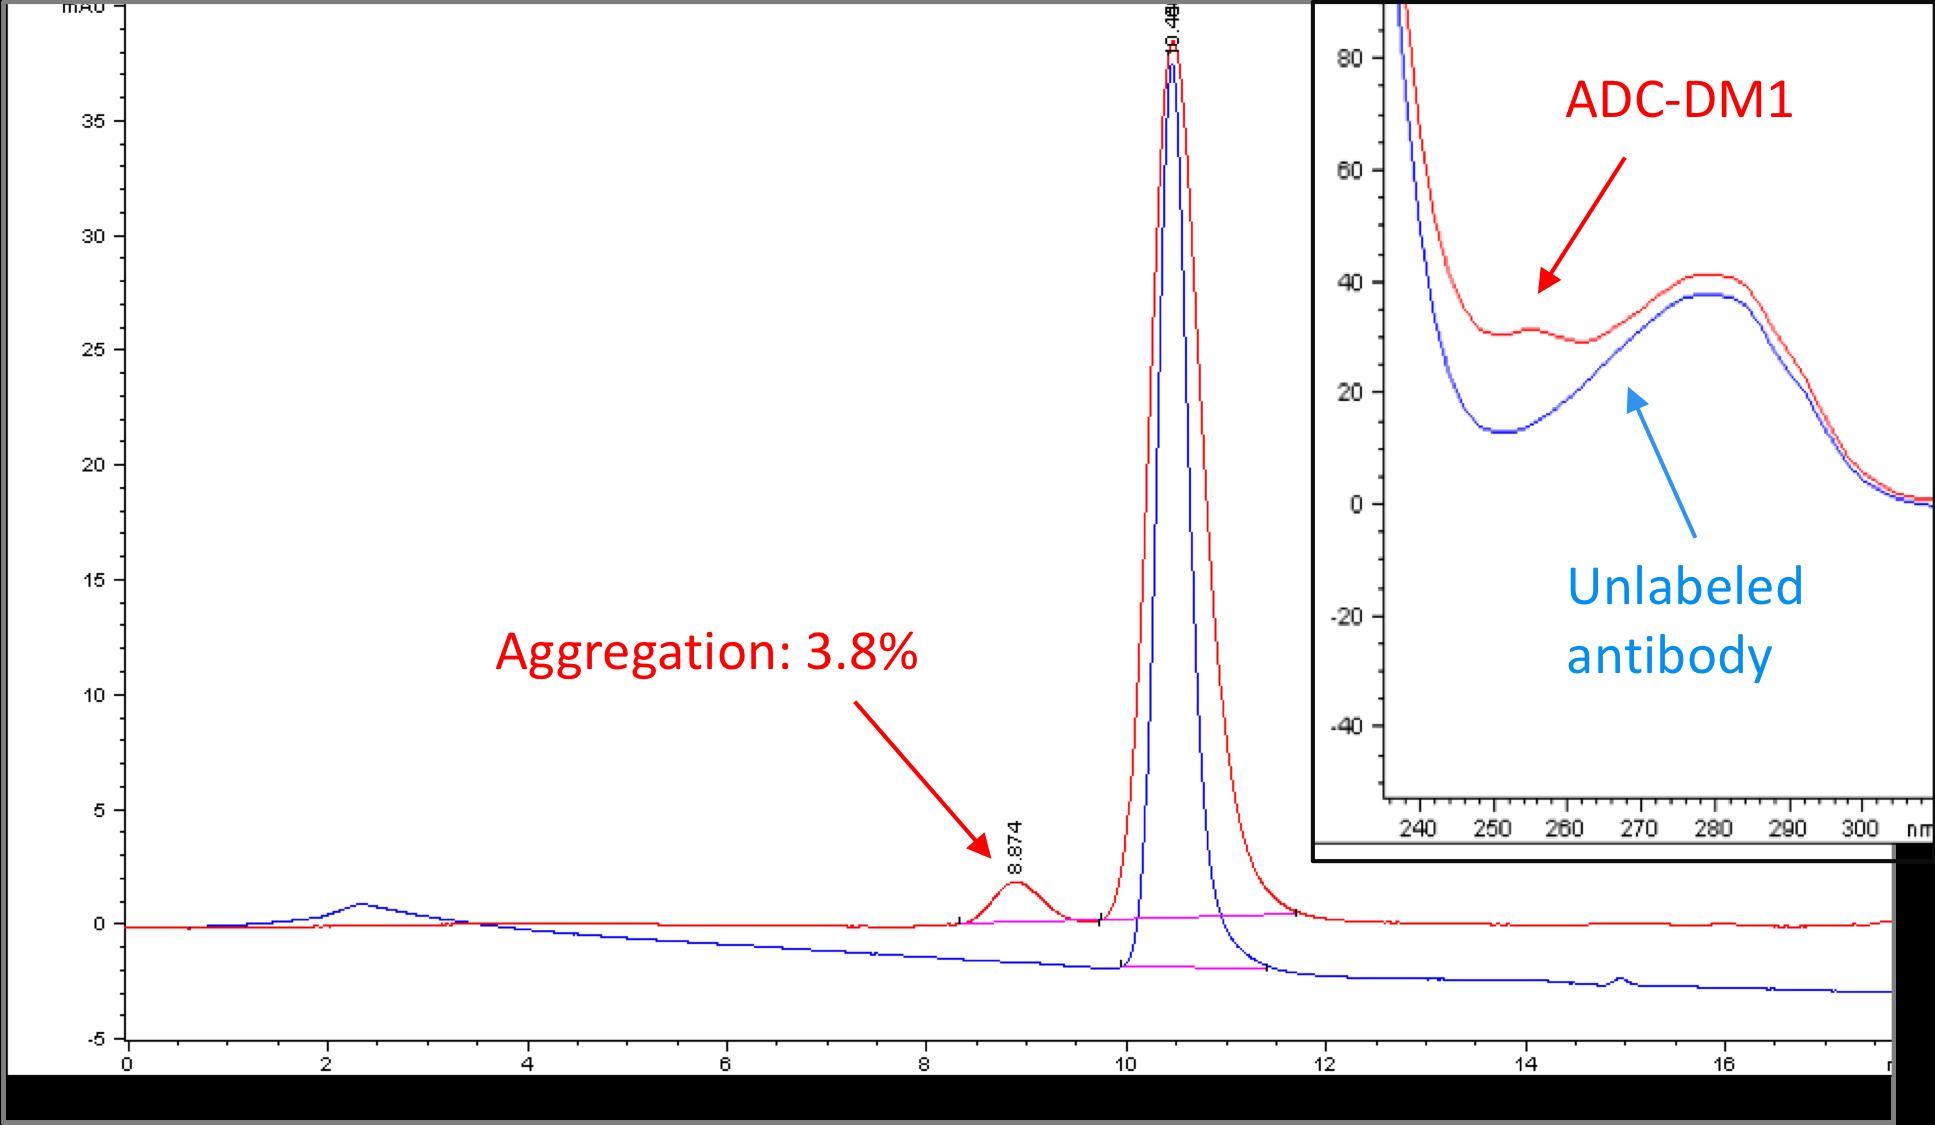 figure-1-dm1-antibody-conjugation-kit-performance.png